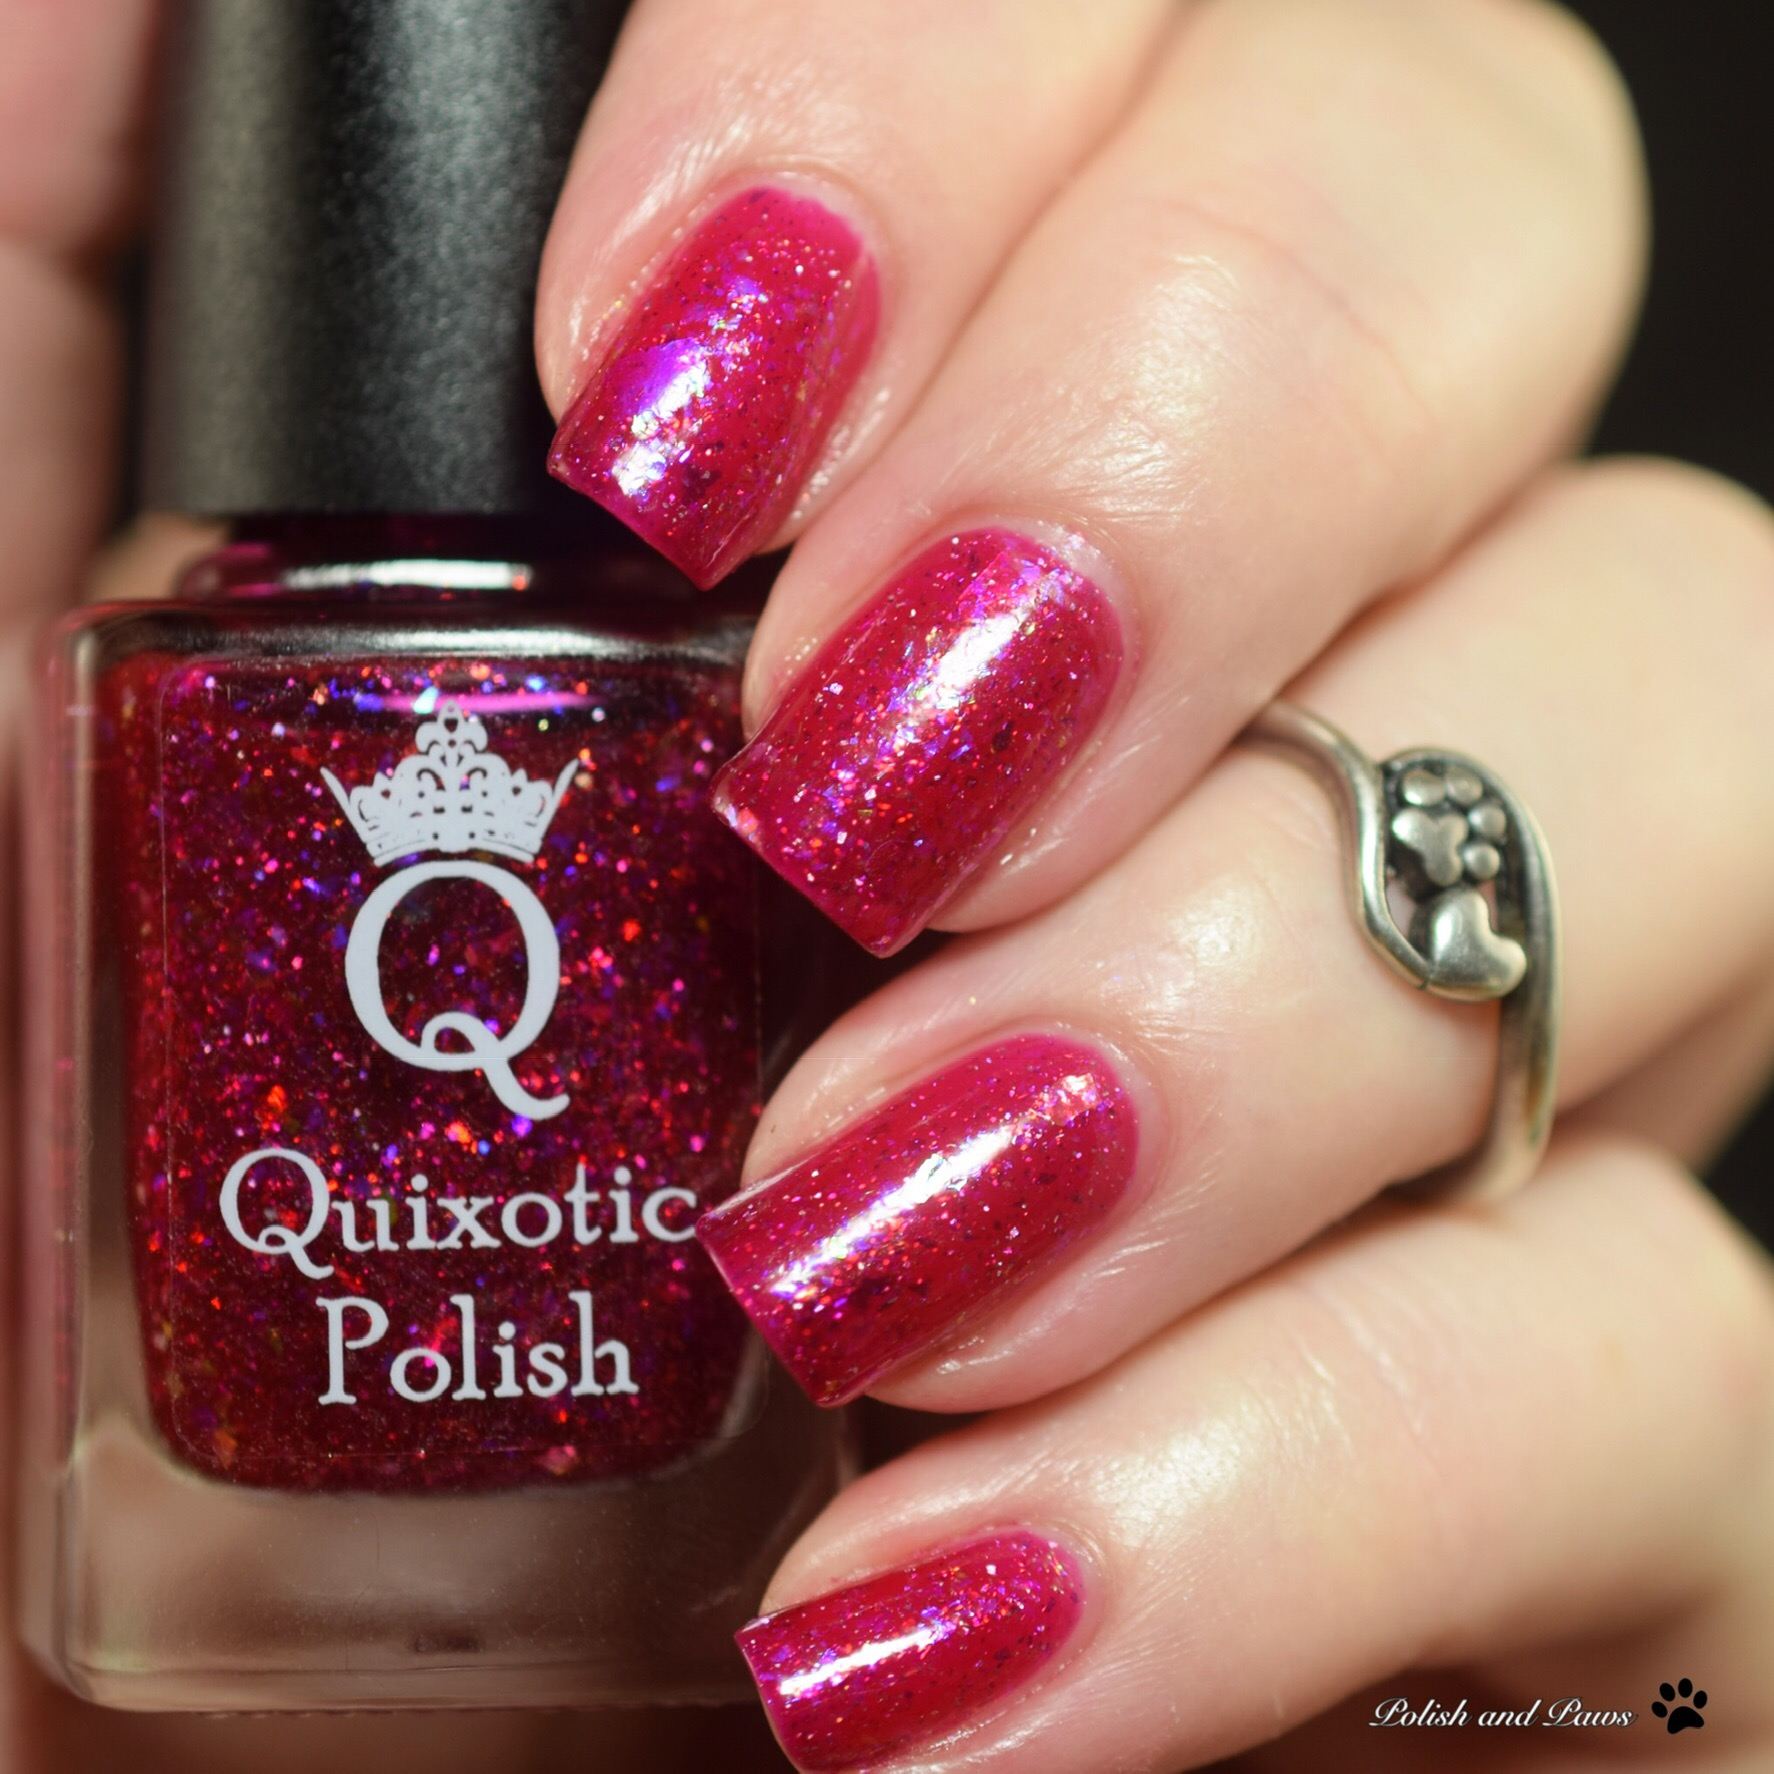 Quixotic Polish Kranberry Sauce